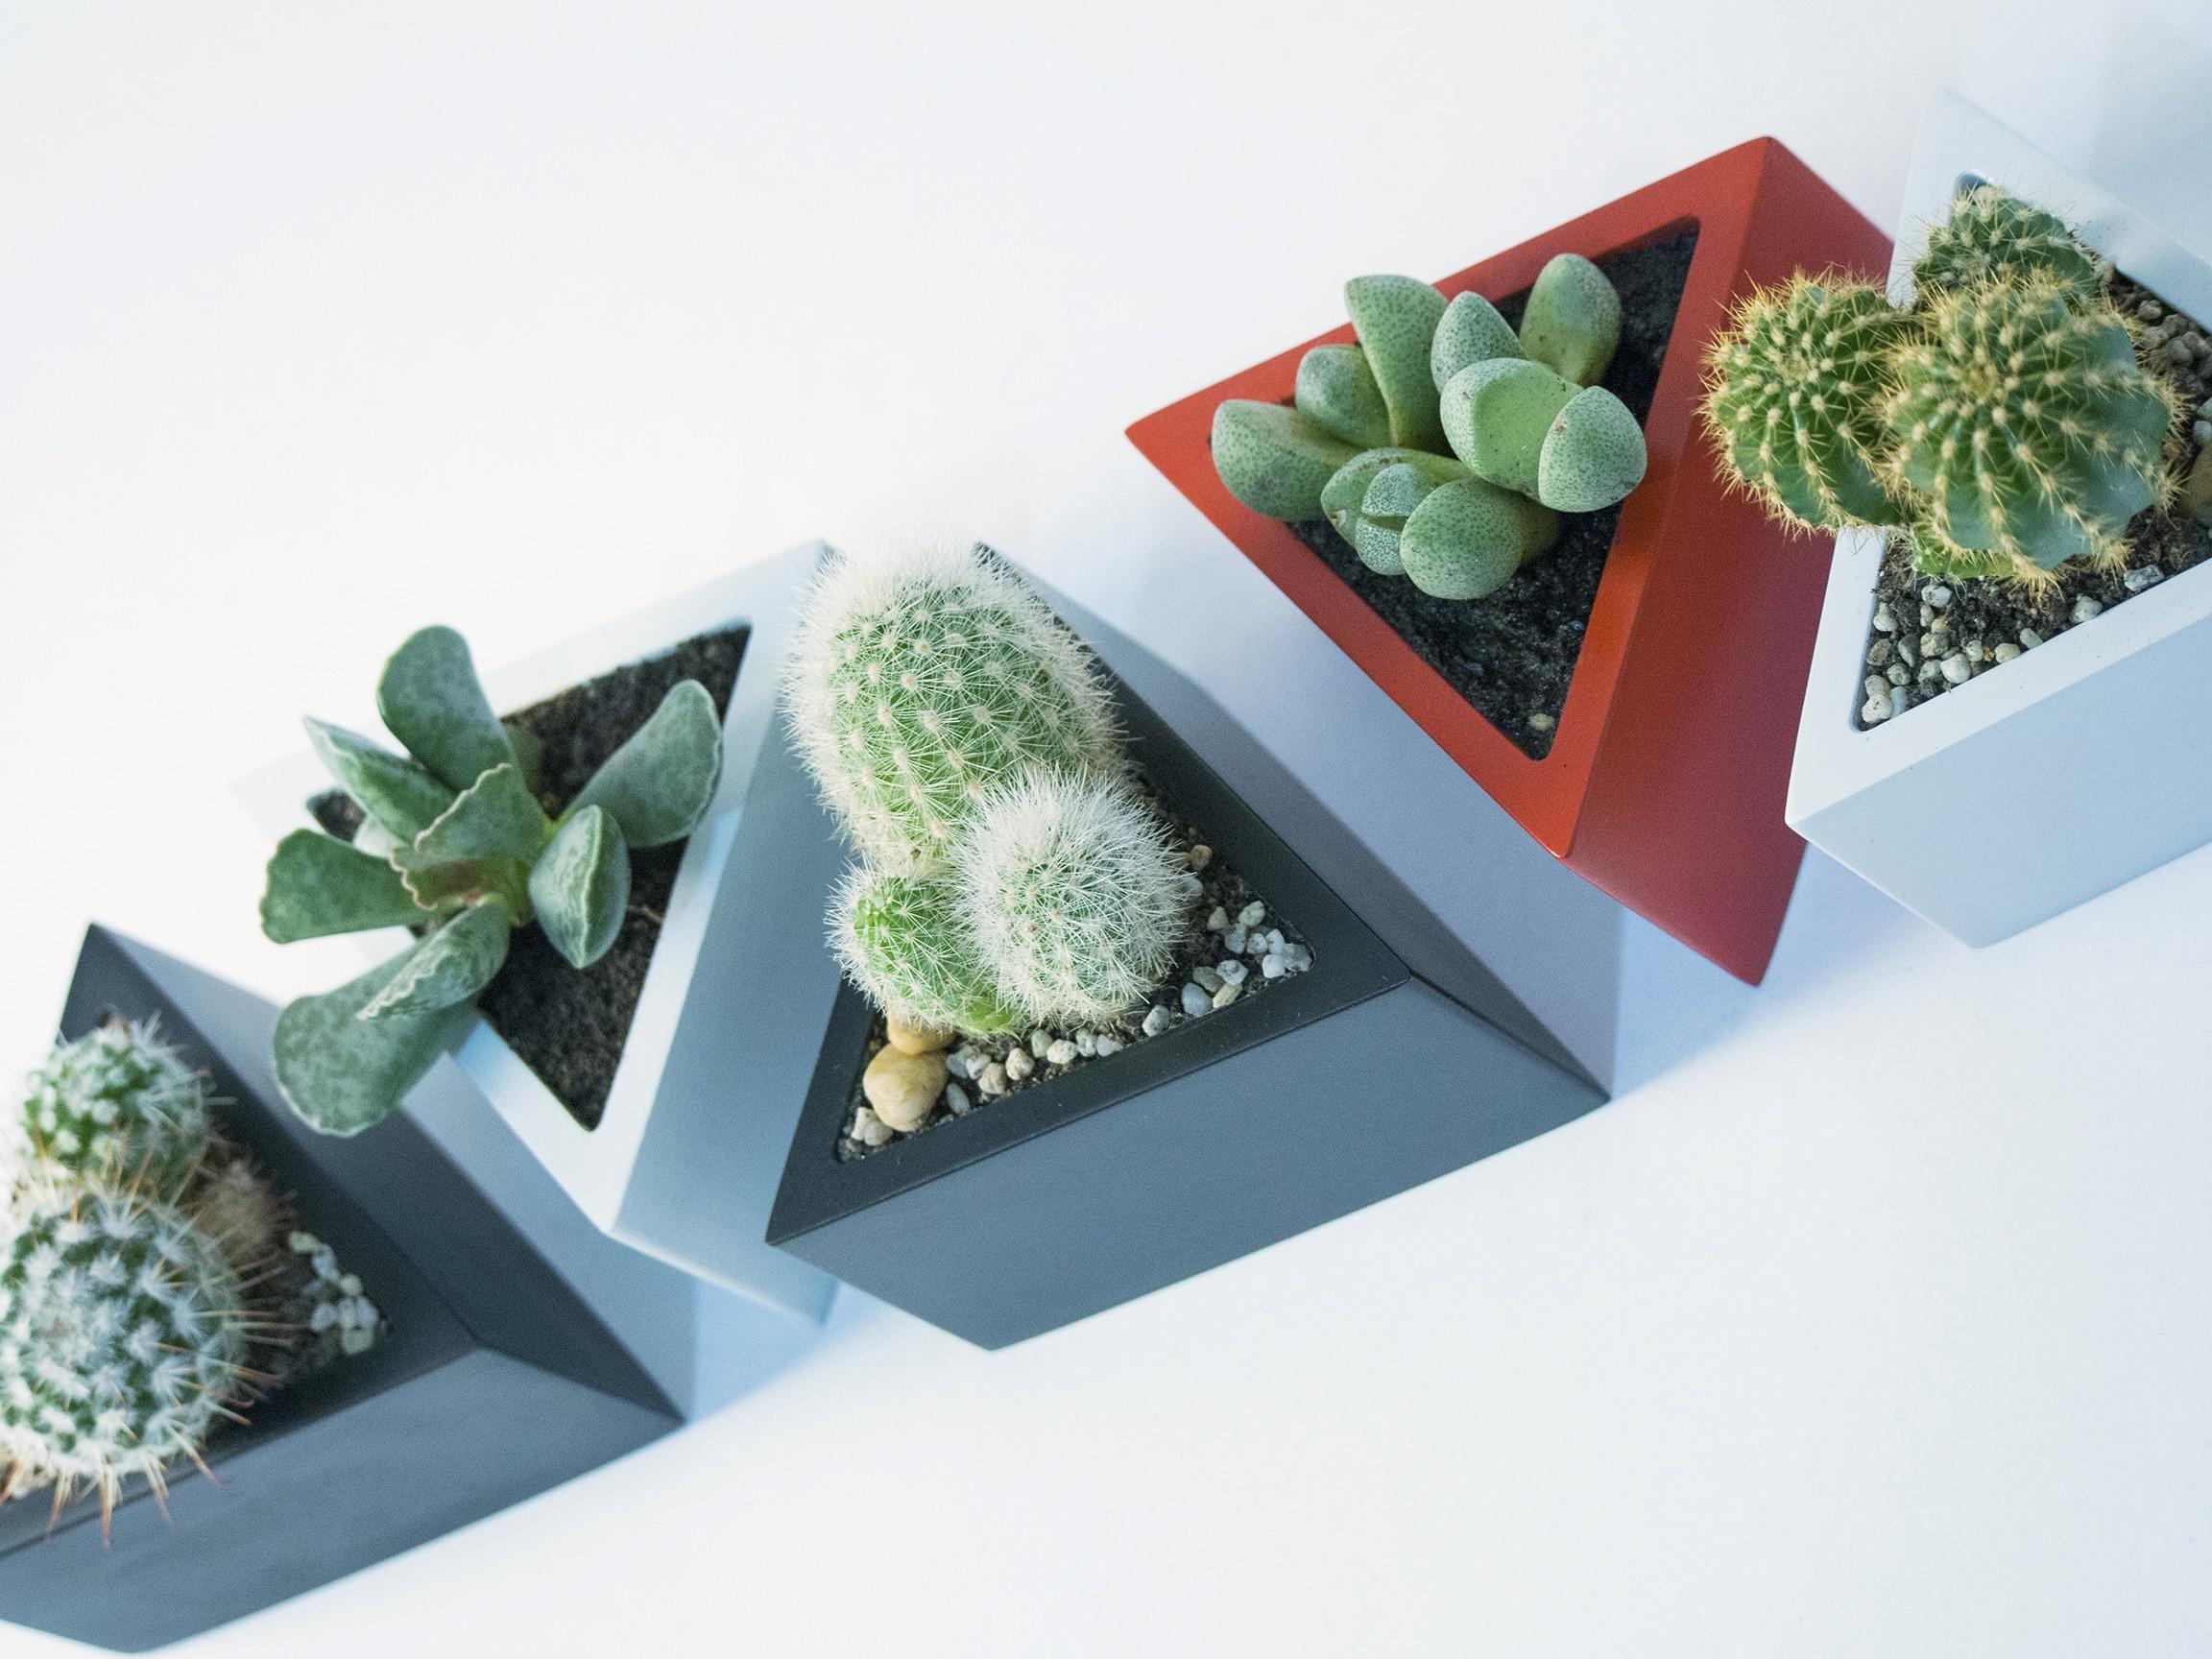 P2090358.jpg Download STL file Prisma planter • 3D print template, atelierro